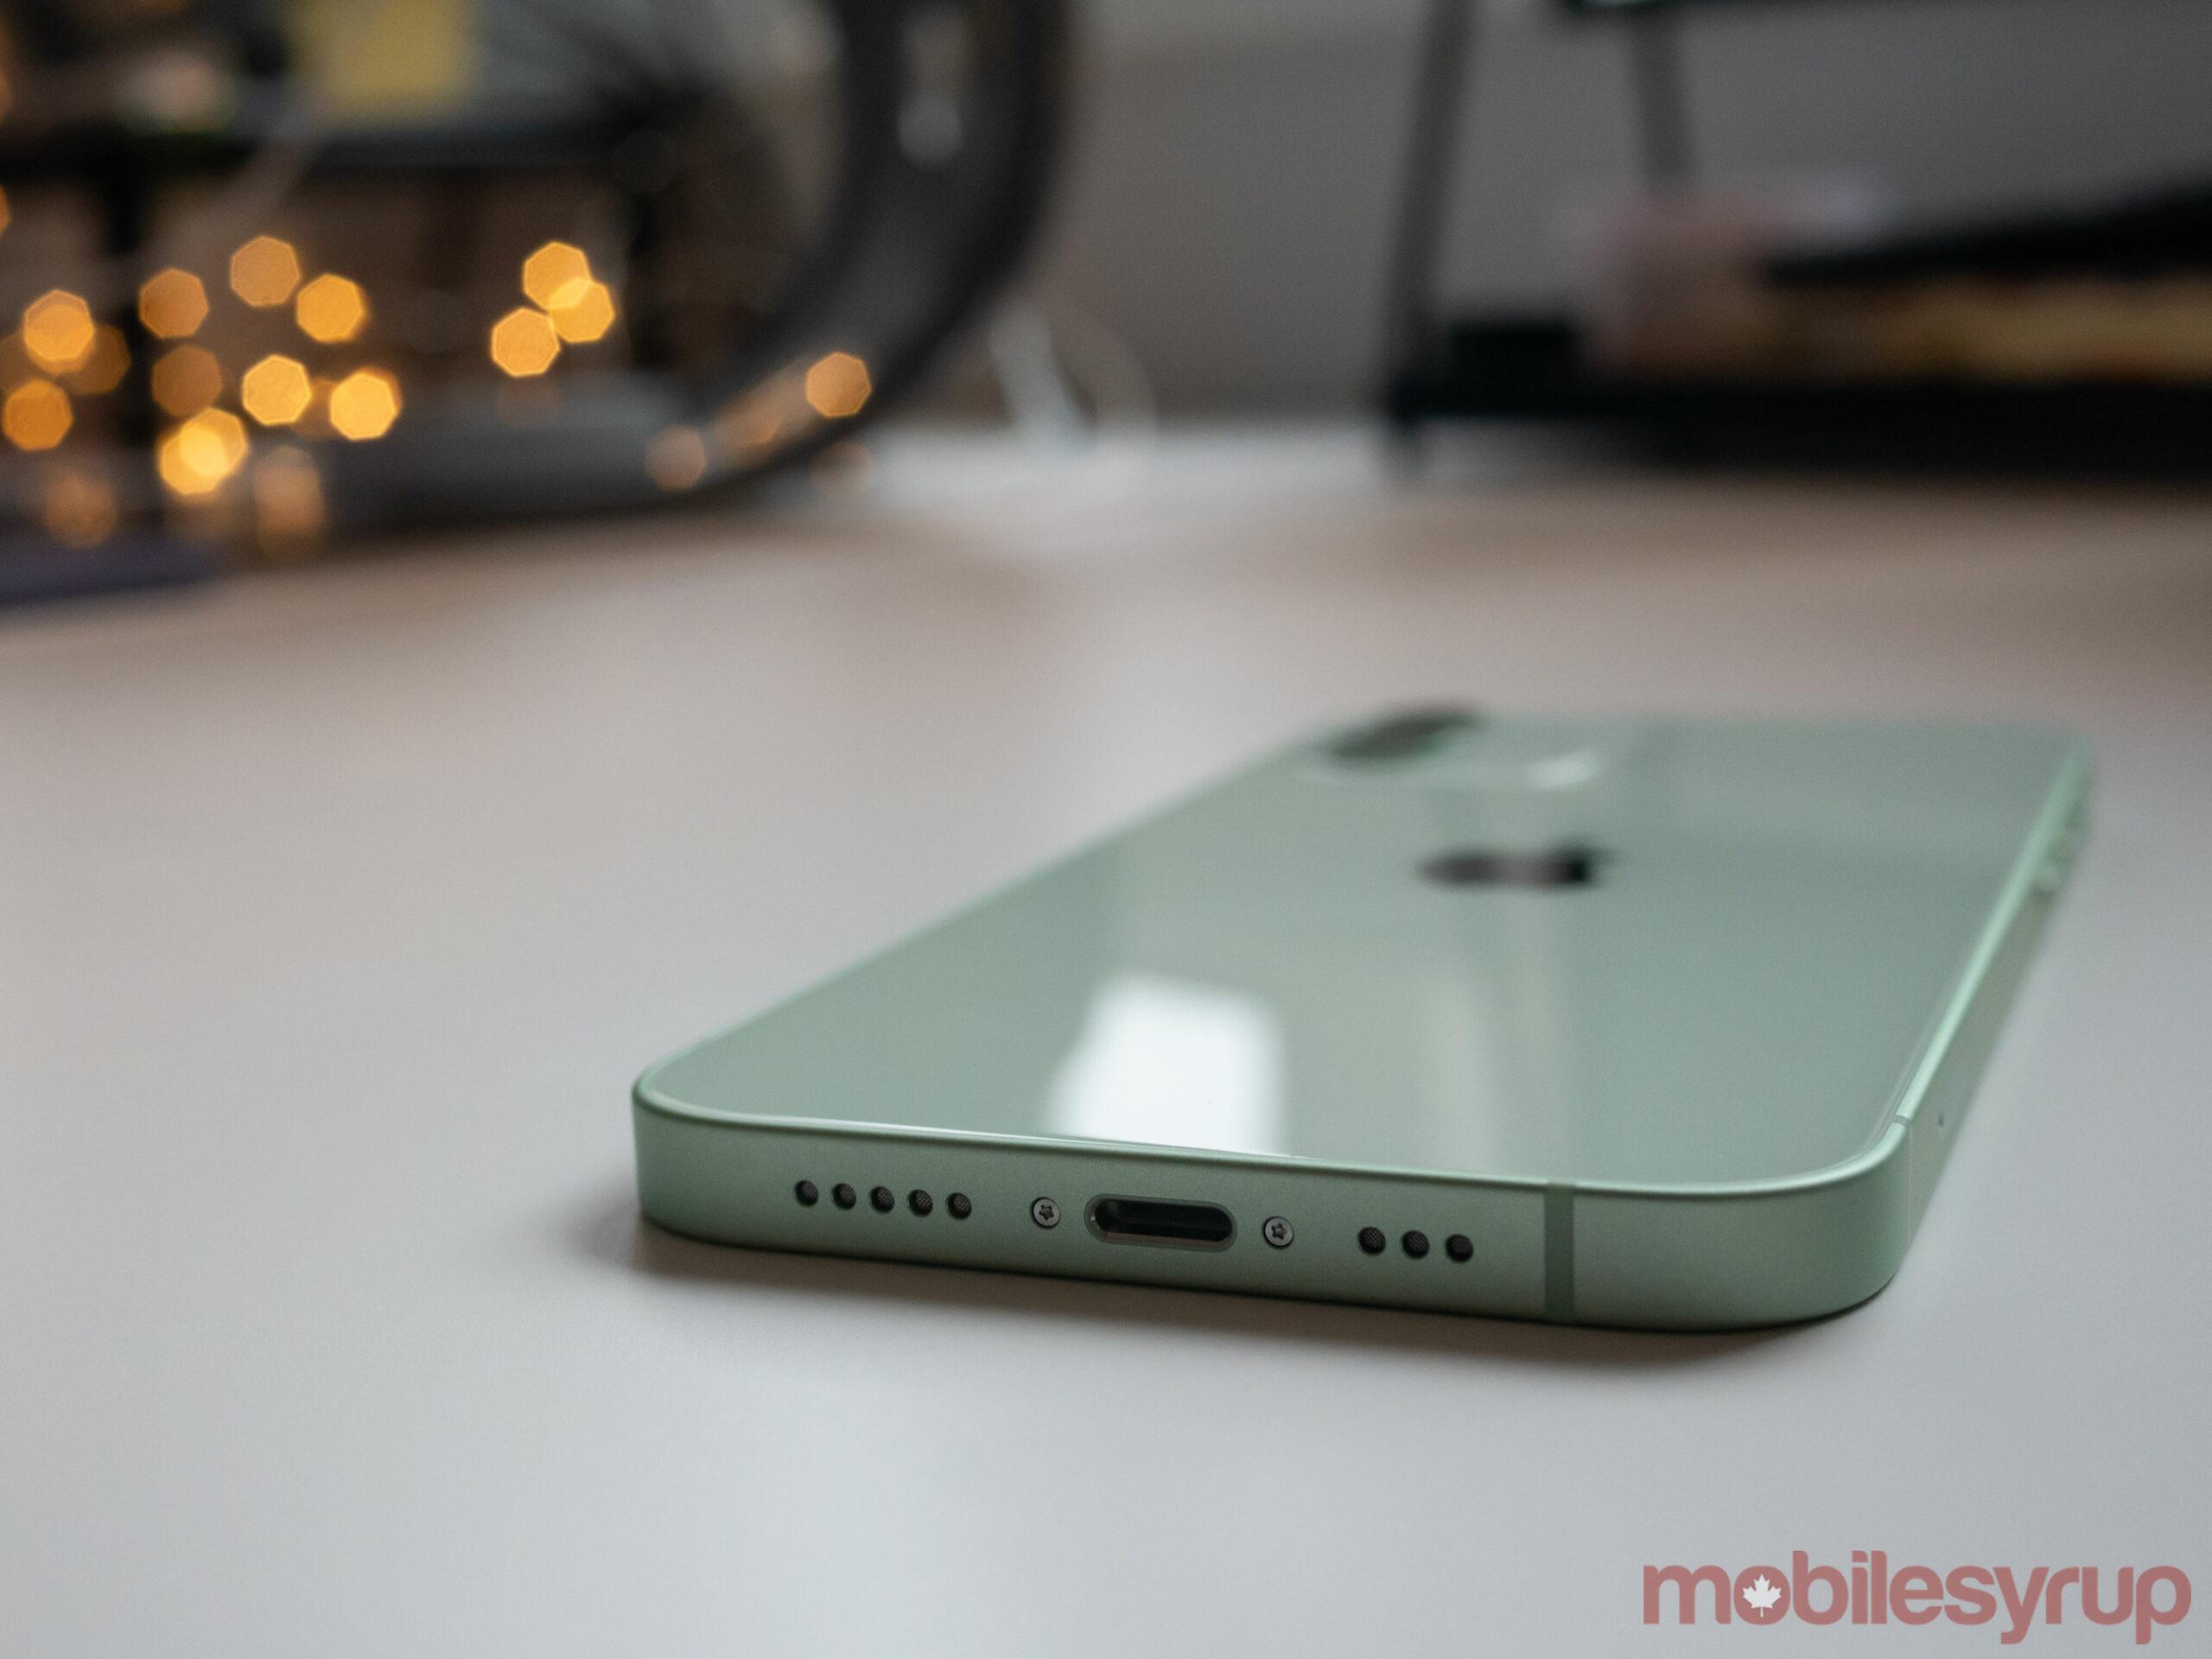 iPhone 12 Lightning port